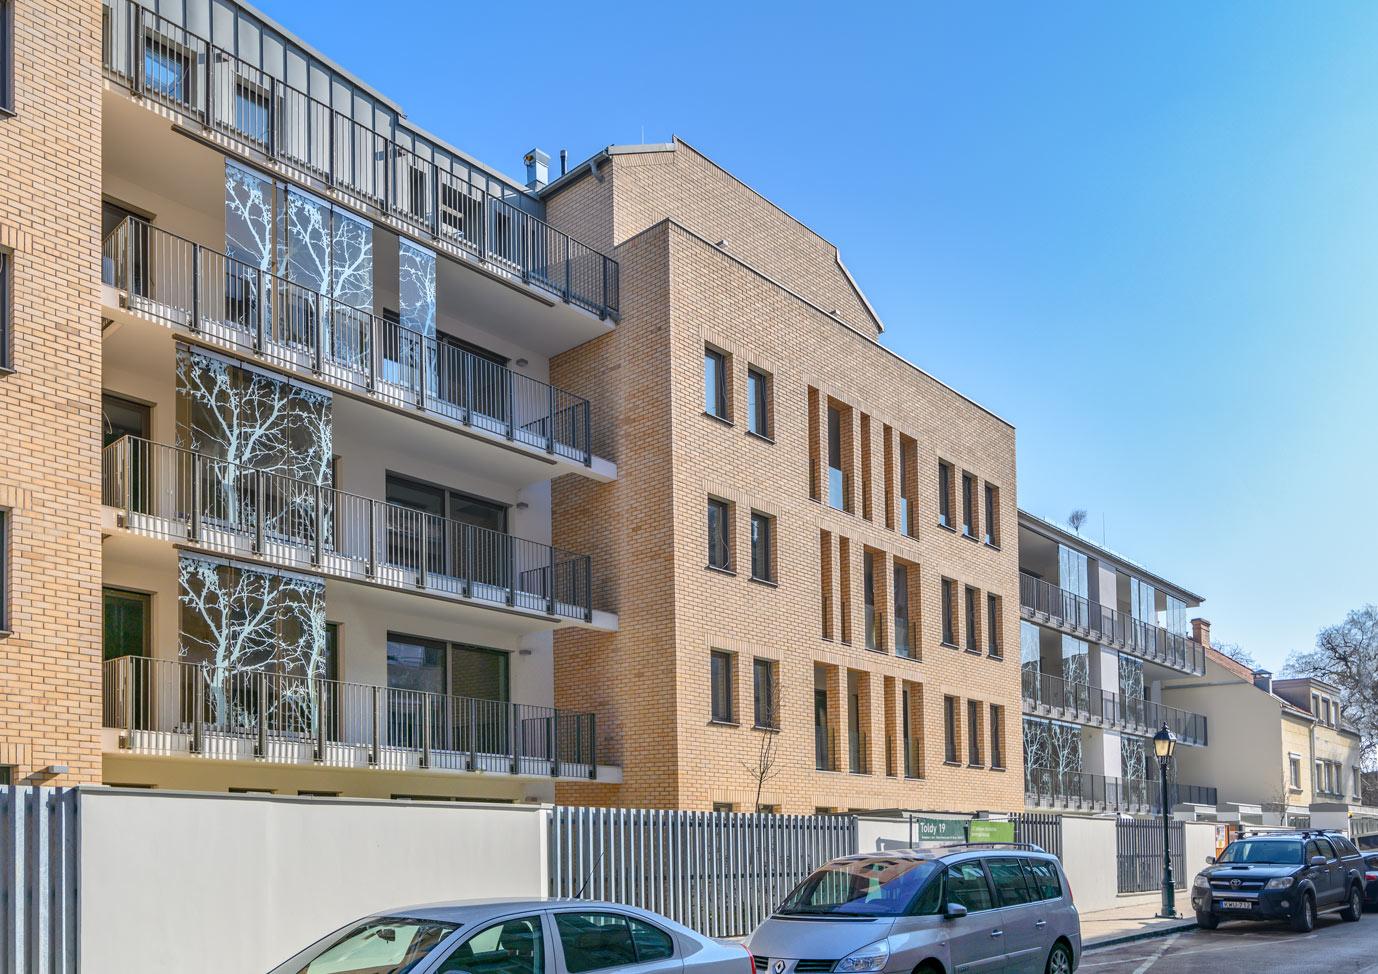 Budapest I. kerület Toldy Ferenc utca 19.